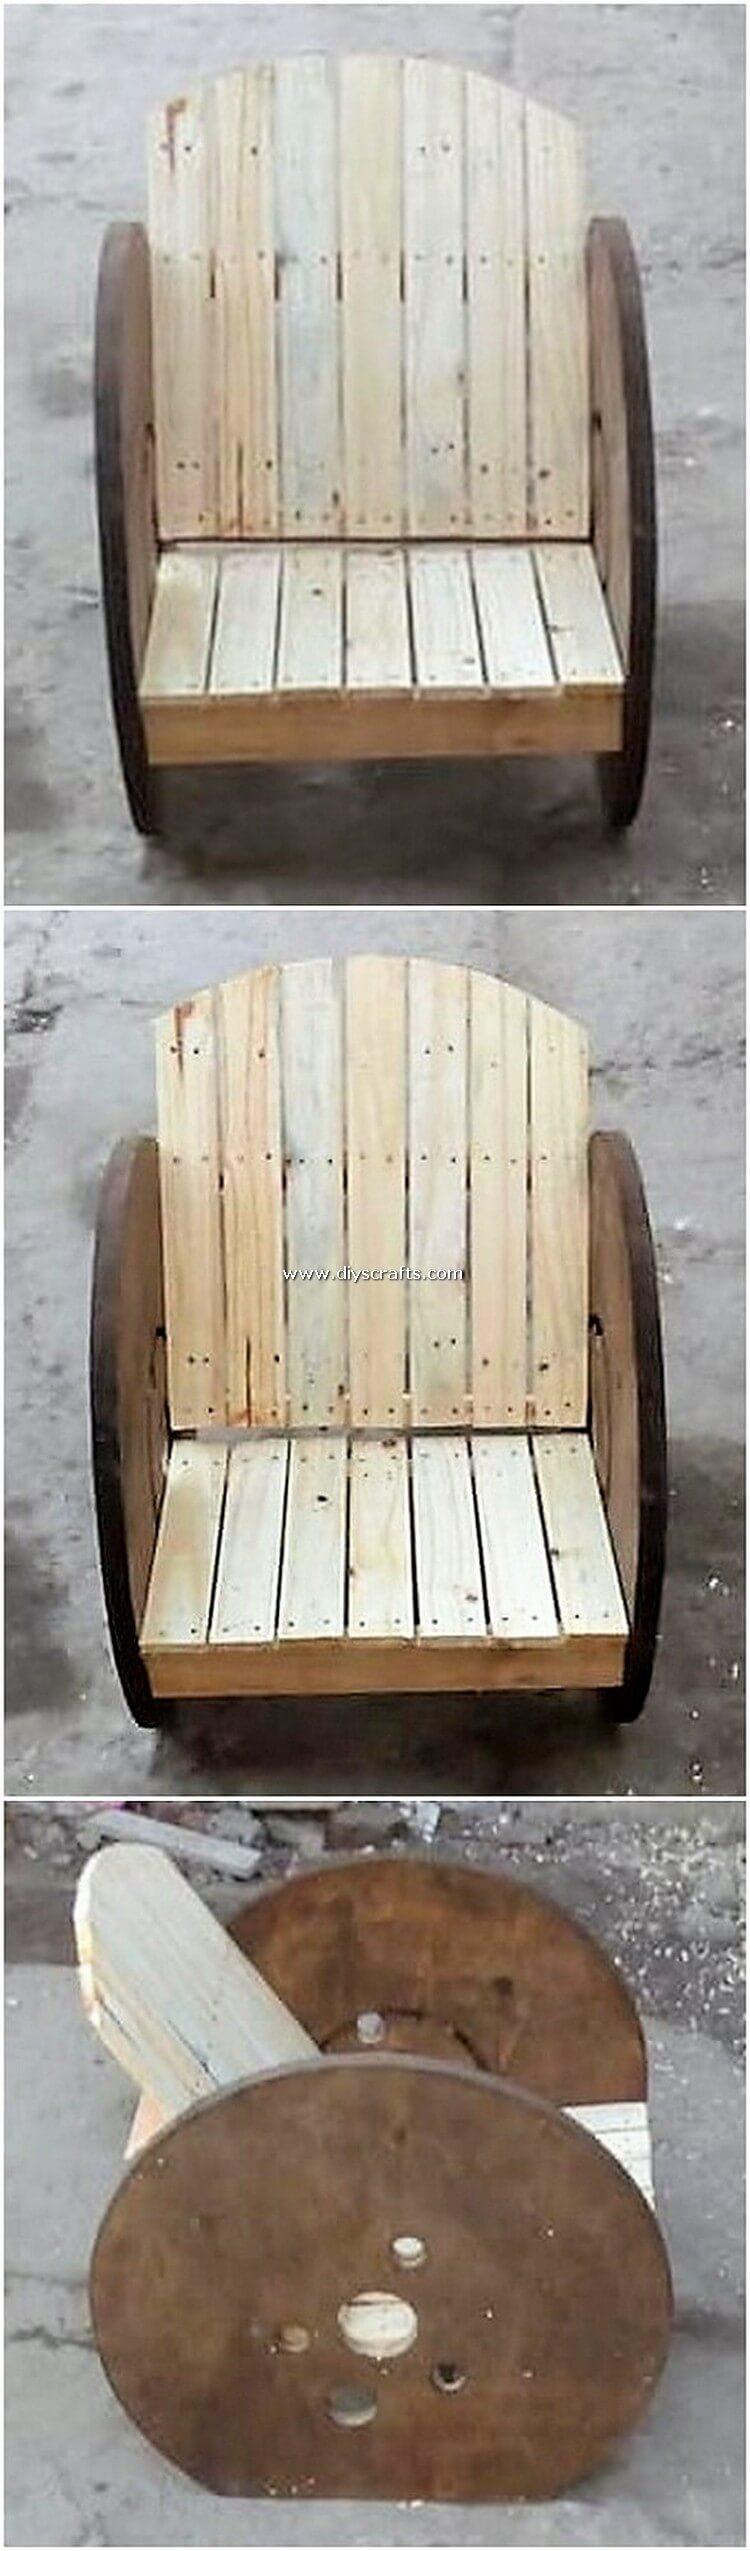 Pallet-Chair-1